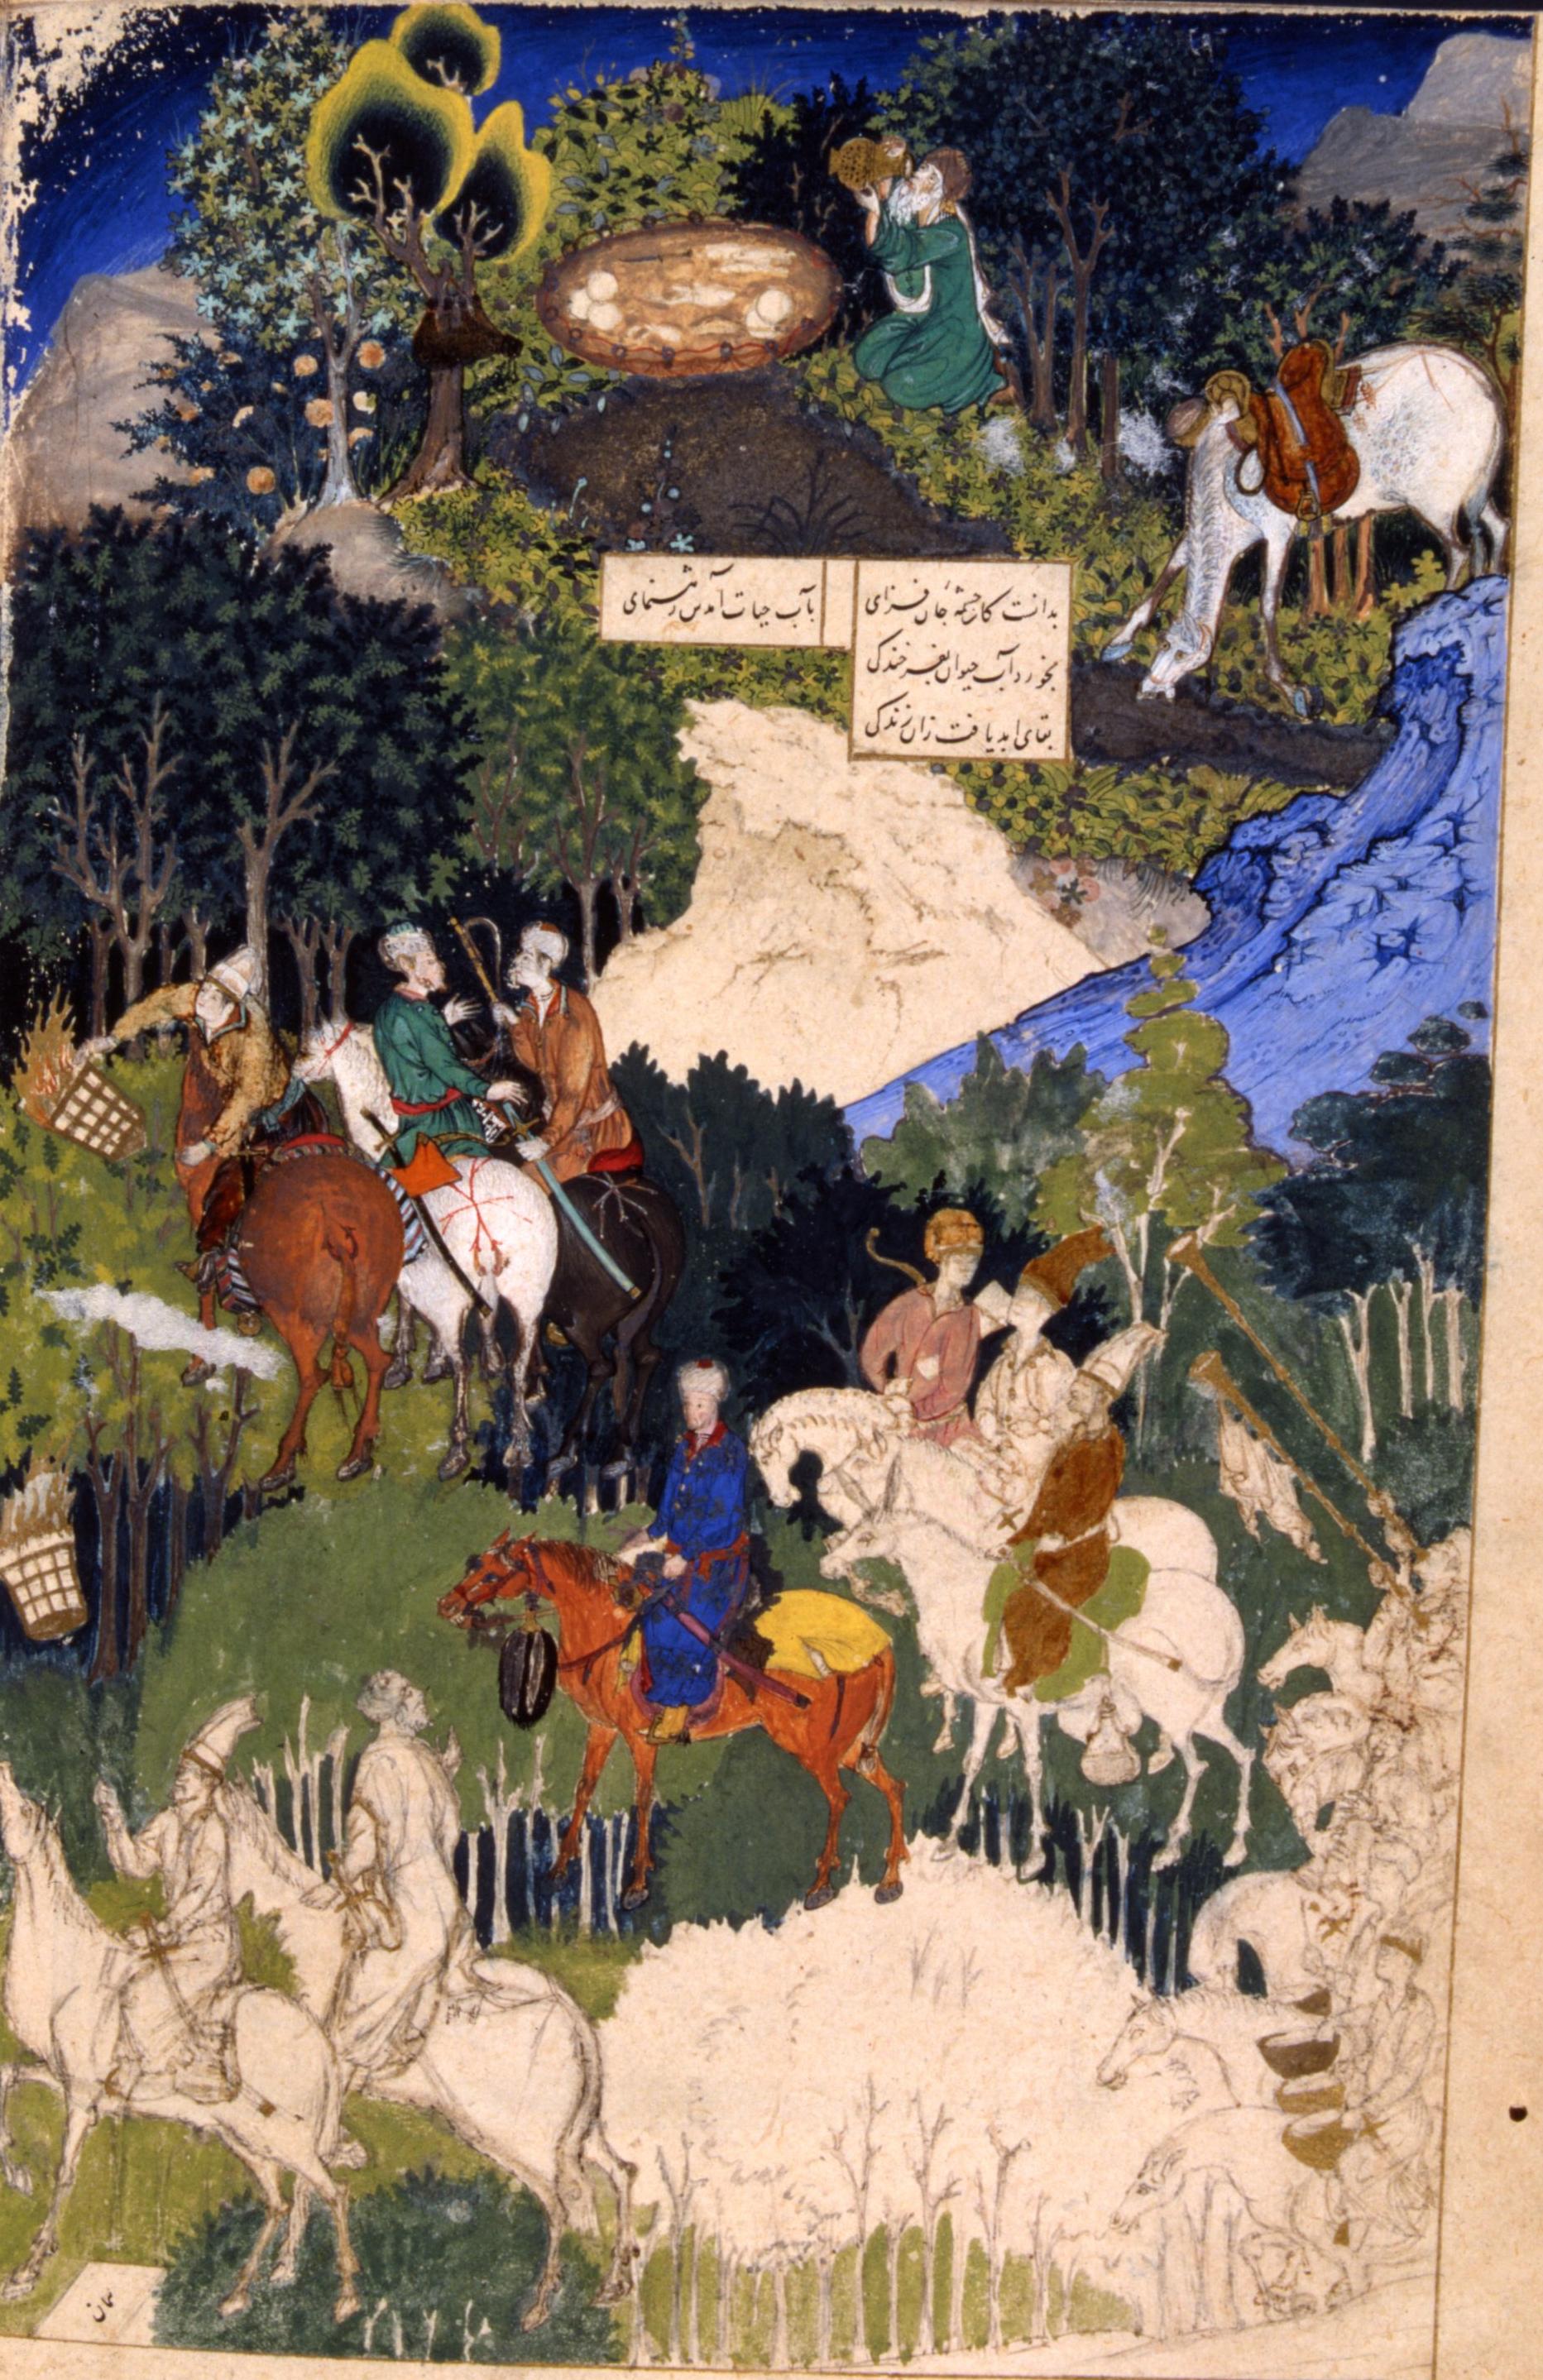 Khizr discovers the Fountain of Life. Nizami's Khamsa. Istanbul, end of the fifteenth century. Topkapi Palace Library, H. 781, fol. 279b.